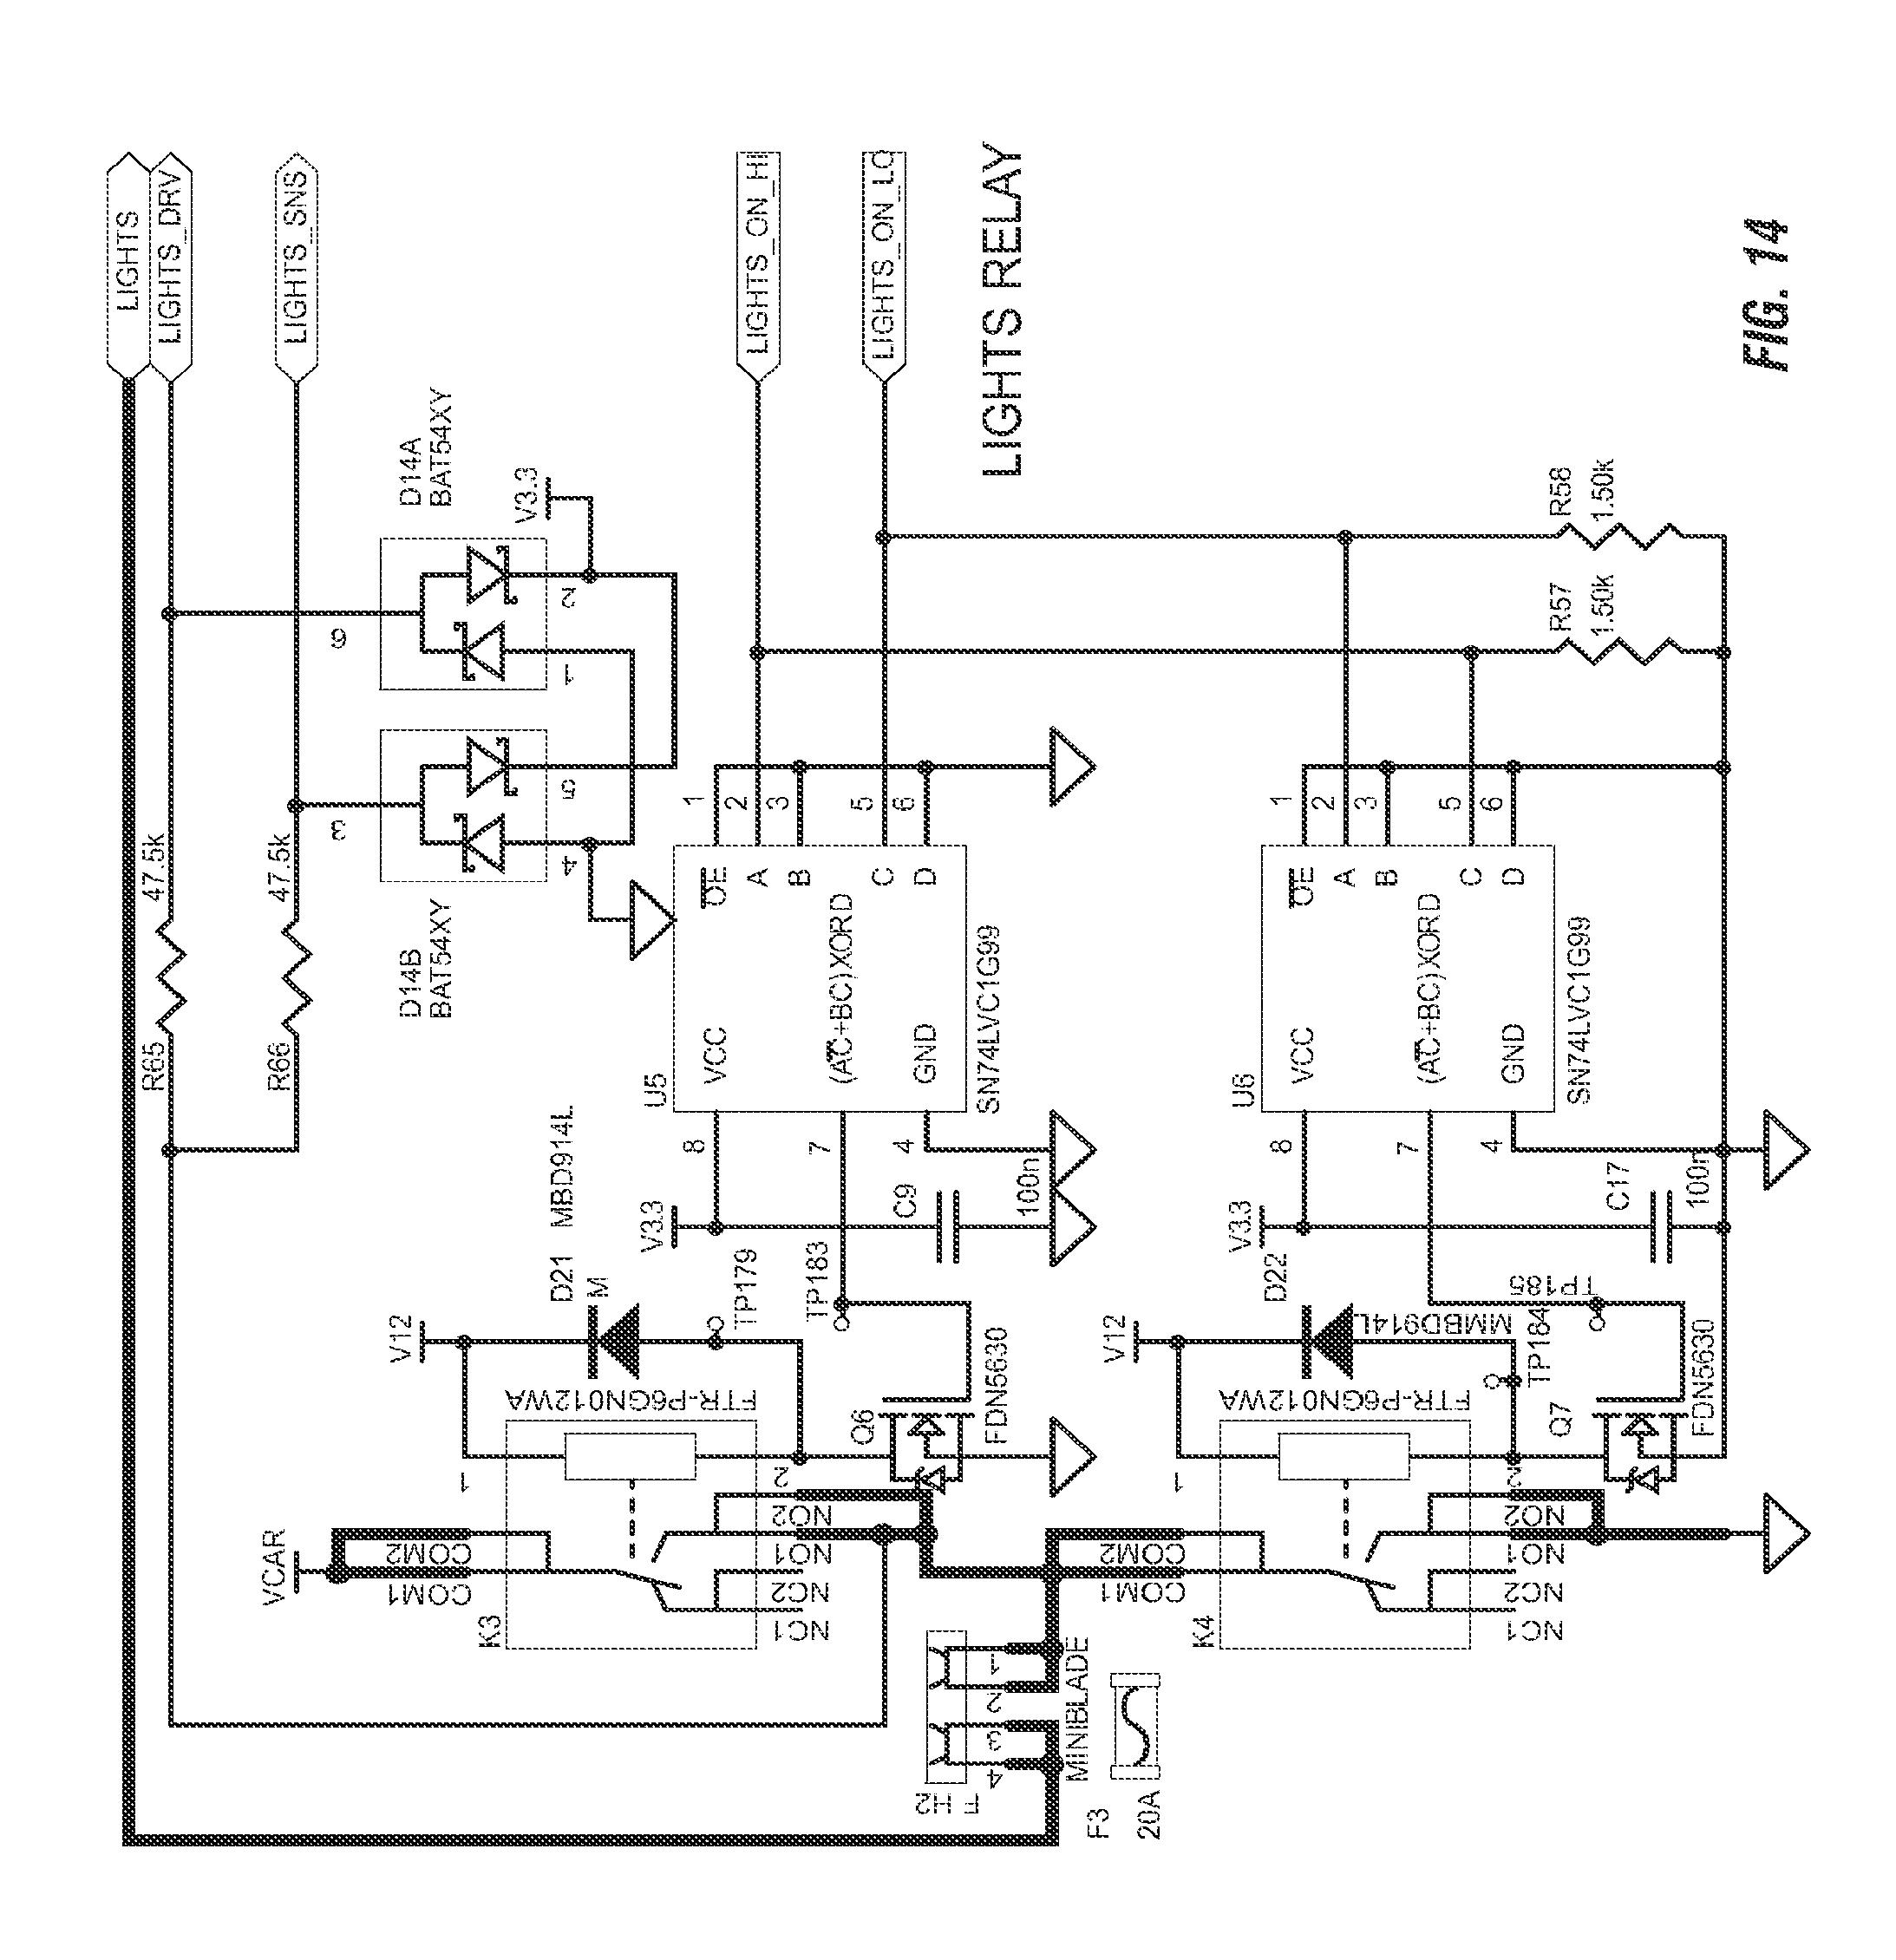 Wiring Diagram For Interlock Device Powerking